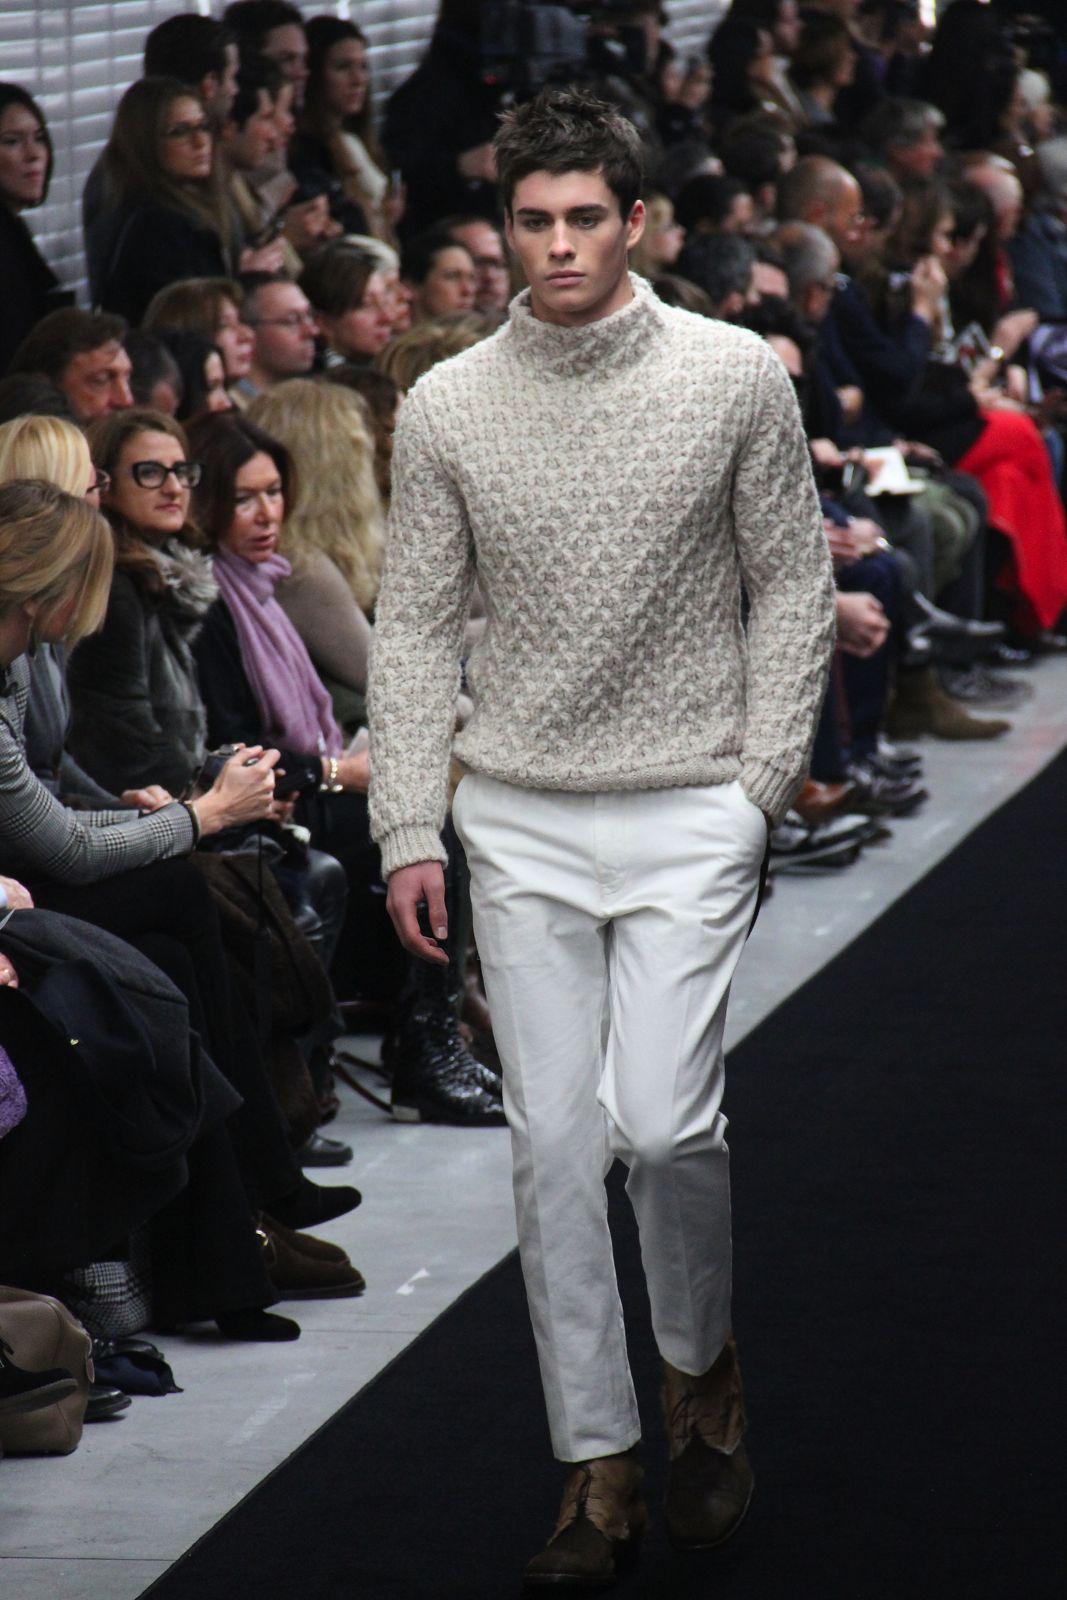 Ermanno Scervino Fall Winter 2012-13 Men's Collection